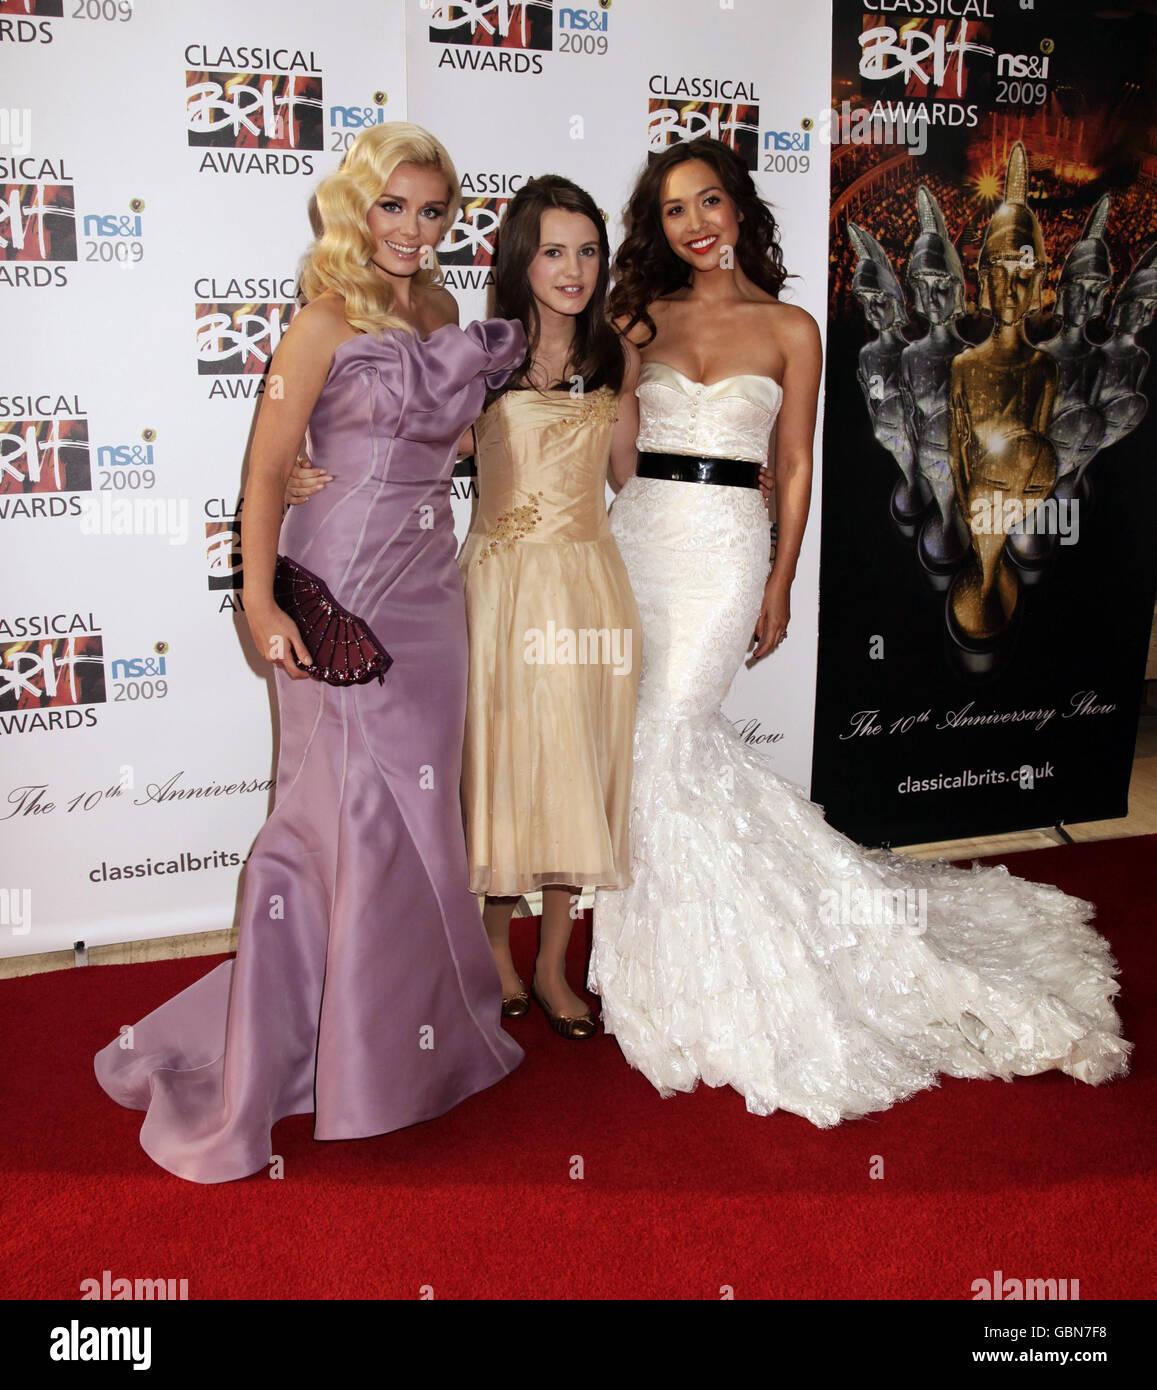 Classical Brit Awards 2009 - London - Stock Image